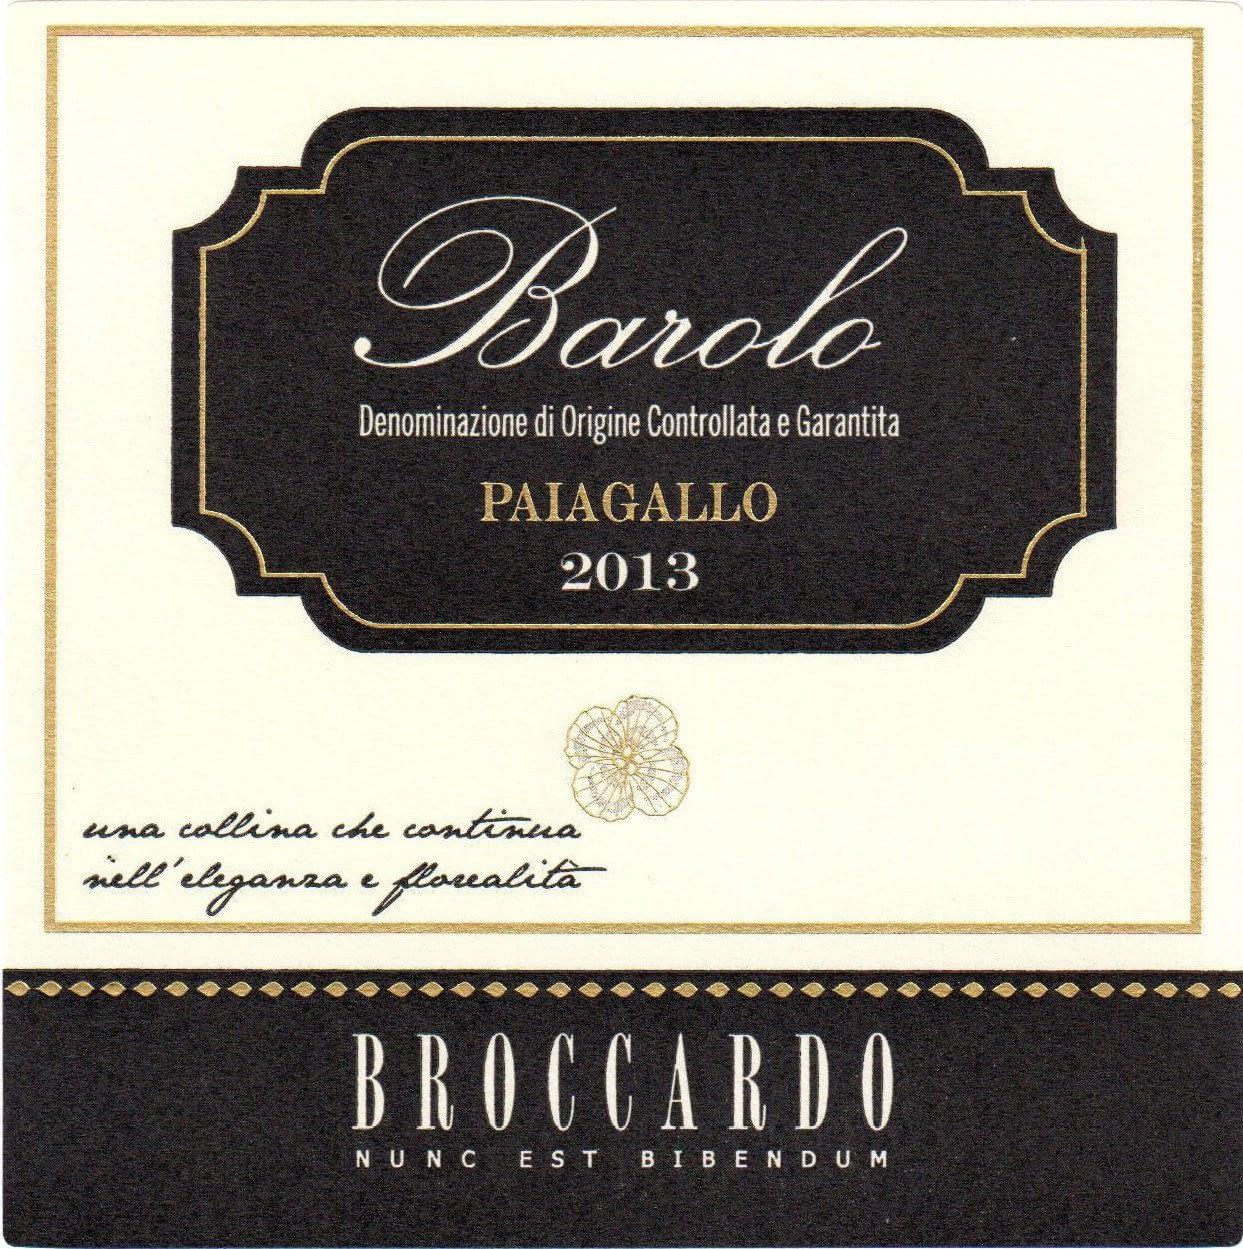 Broccardo Barolo Paiagallo Magnum 2012